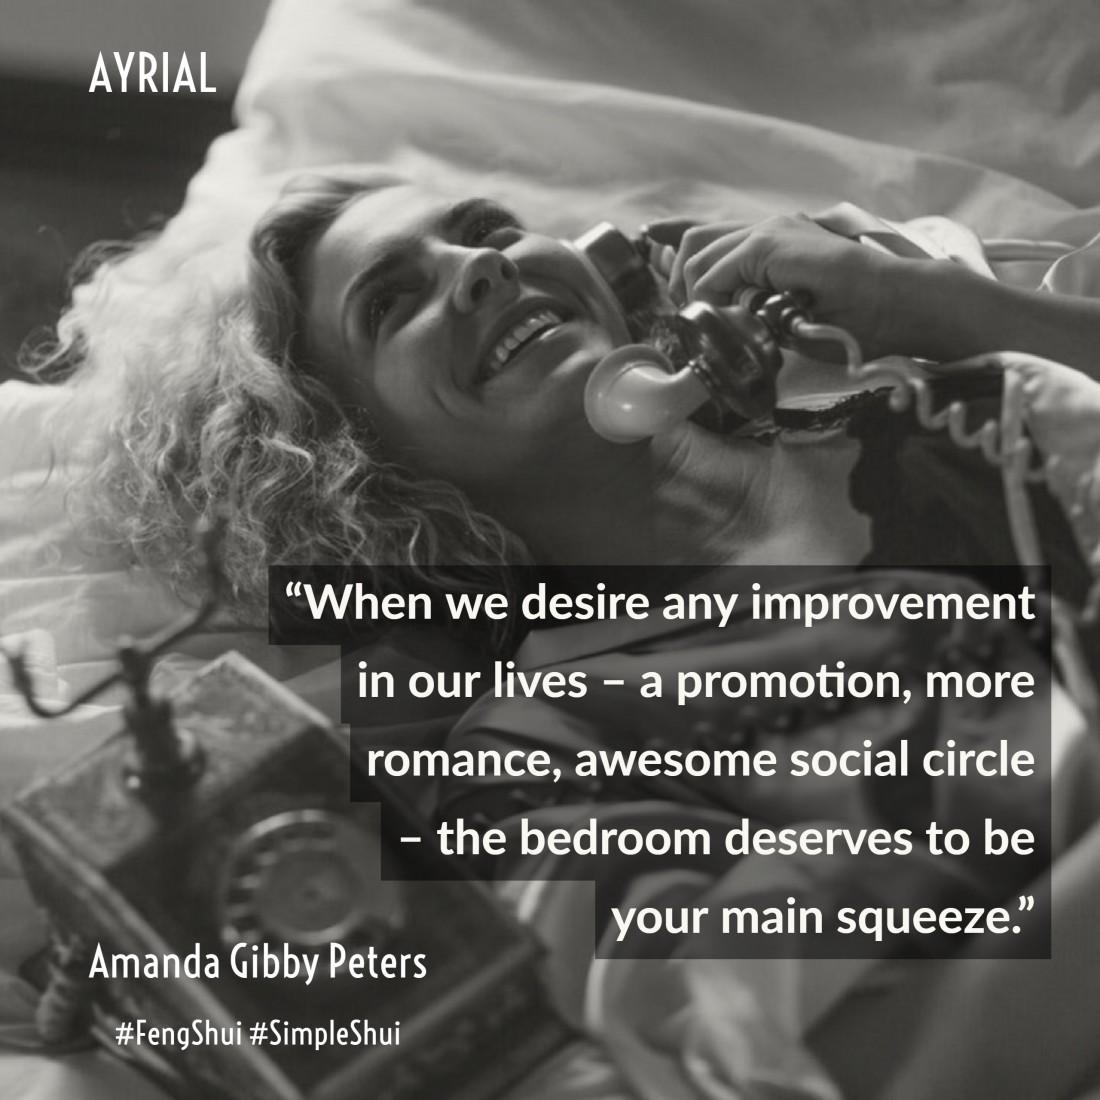 AYRIAL - BEDROOM FENG SHUI BY AMANDA GIBBY PETERS